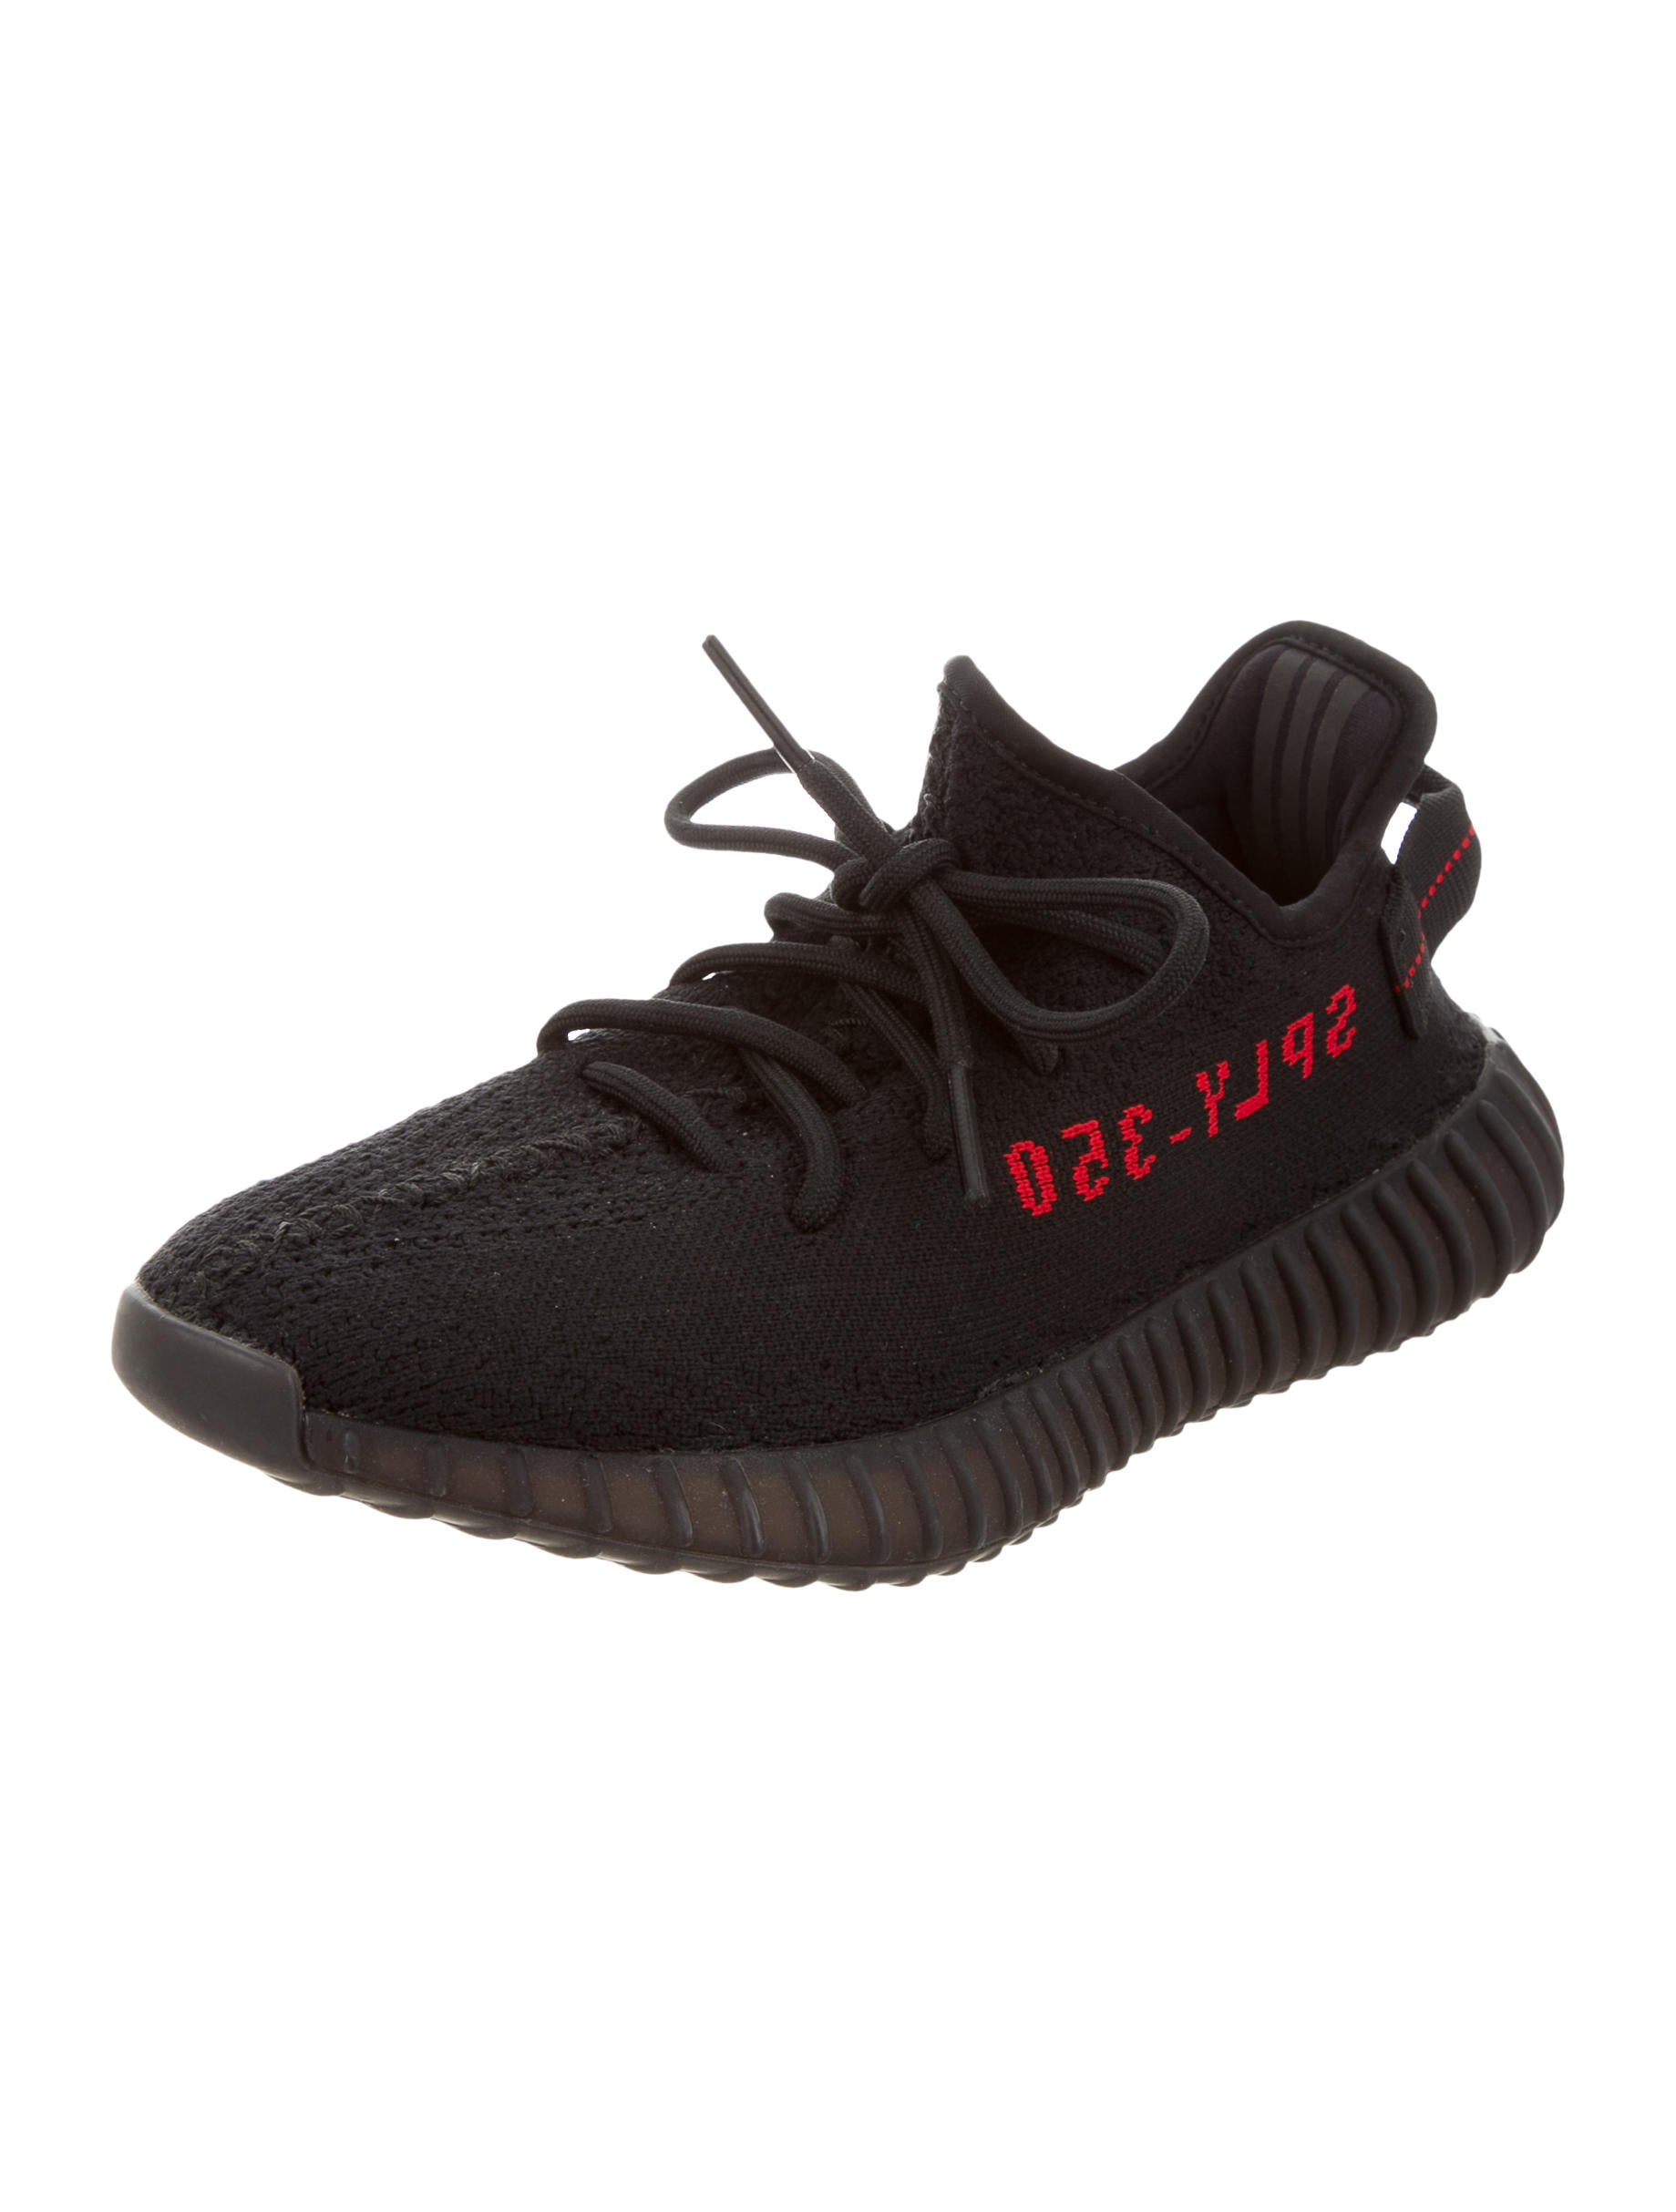 Adidas Yeezy Style Shoes